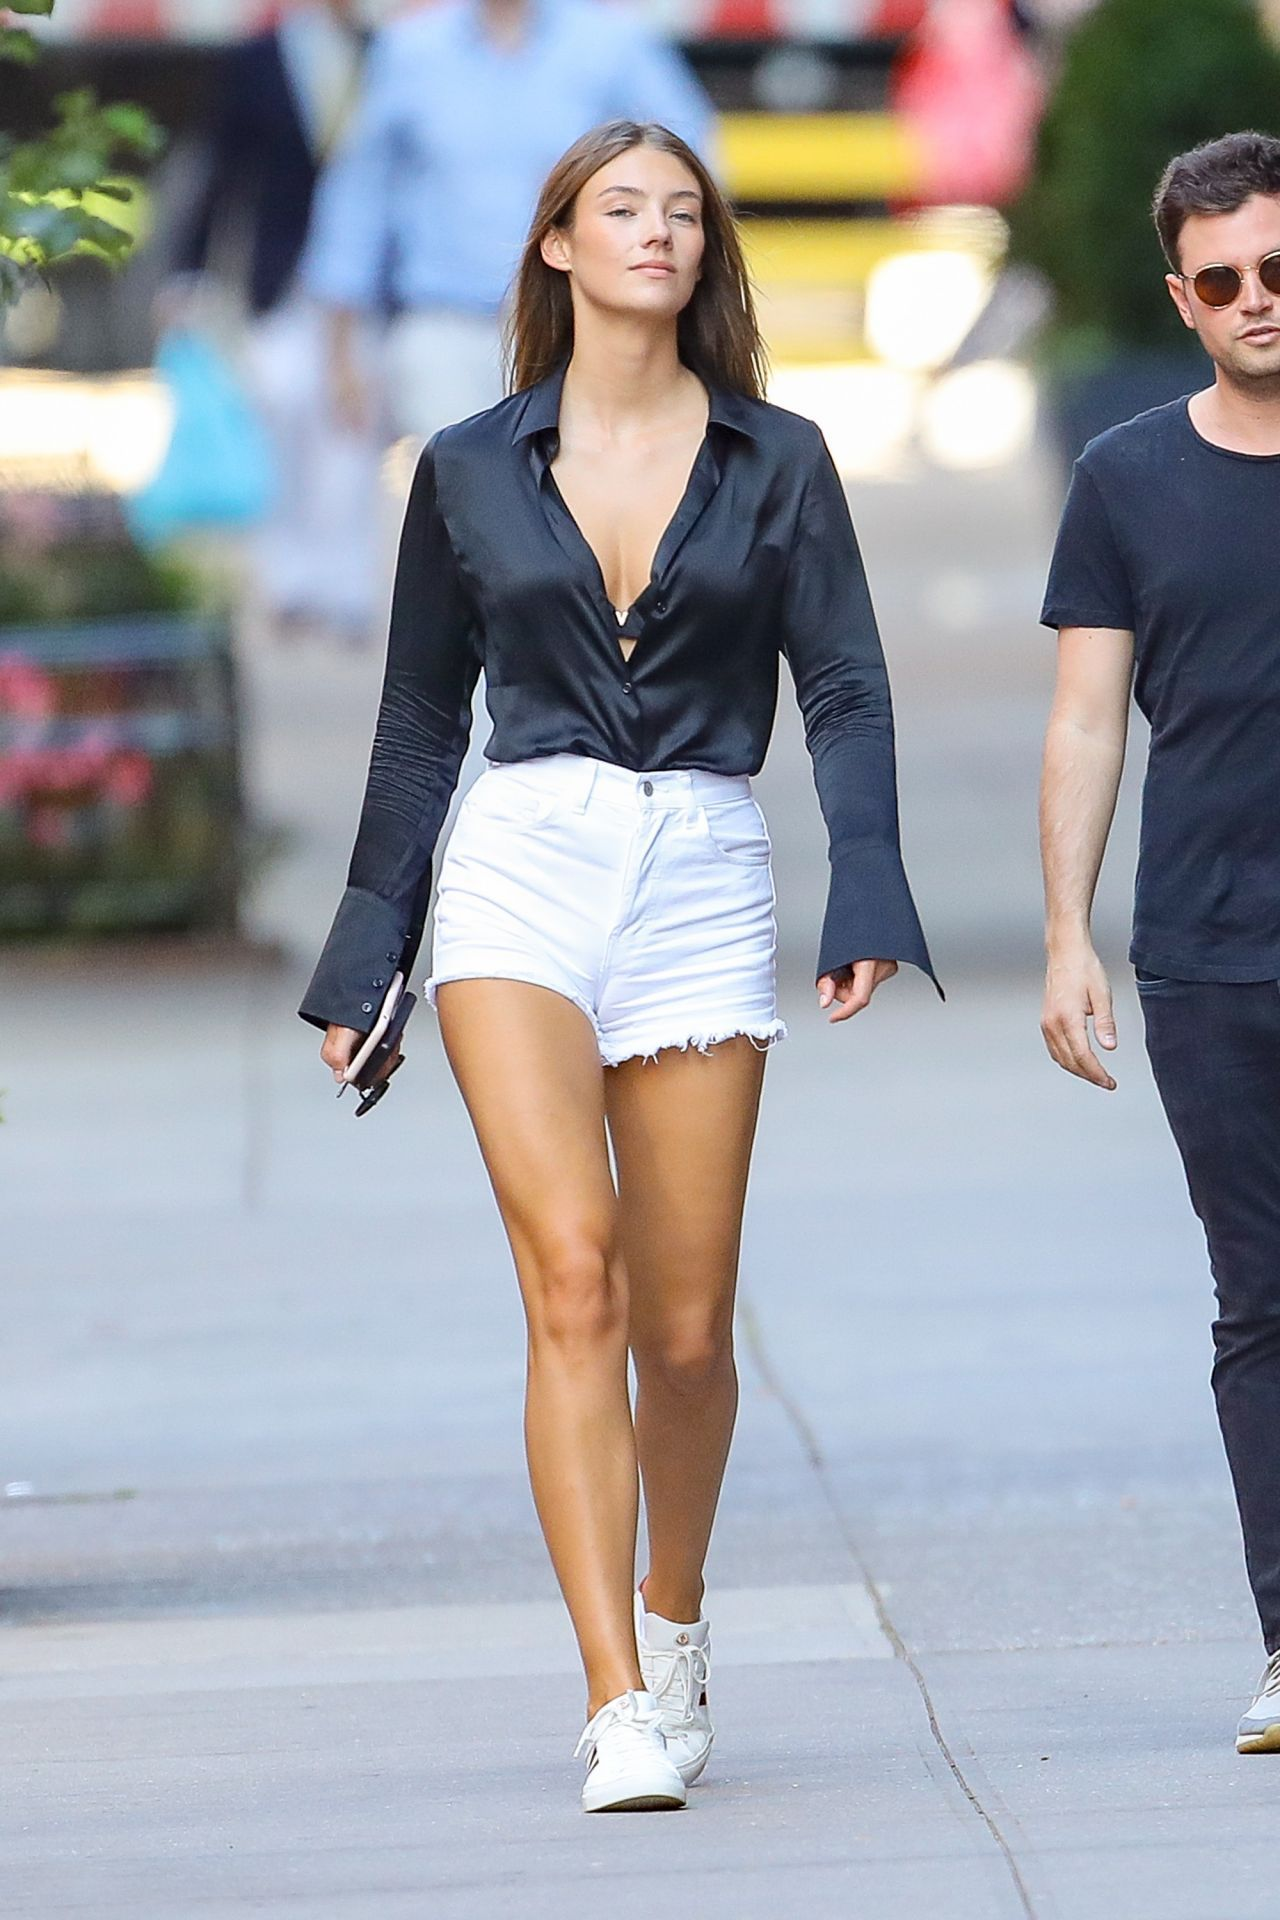 Lorena Rae简装现身街头,不愧是筛选过的超模,身材比例堪称完美